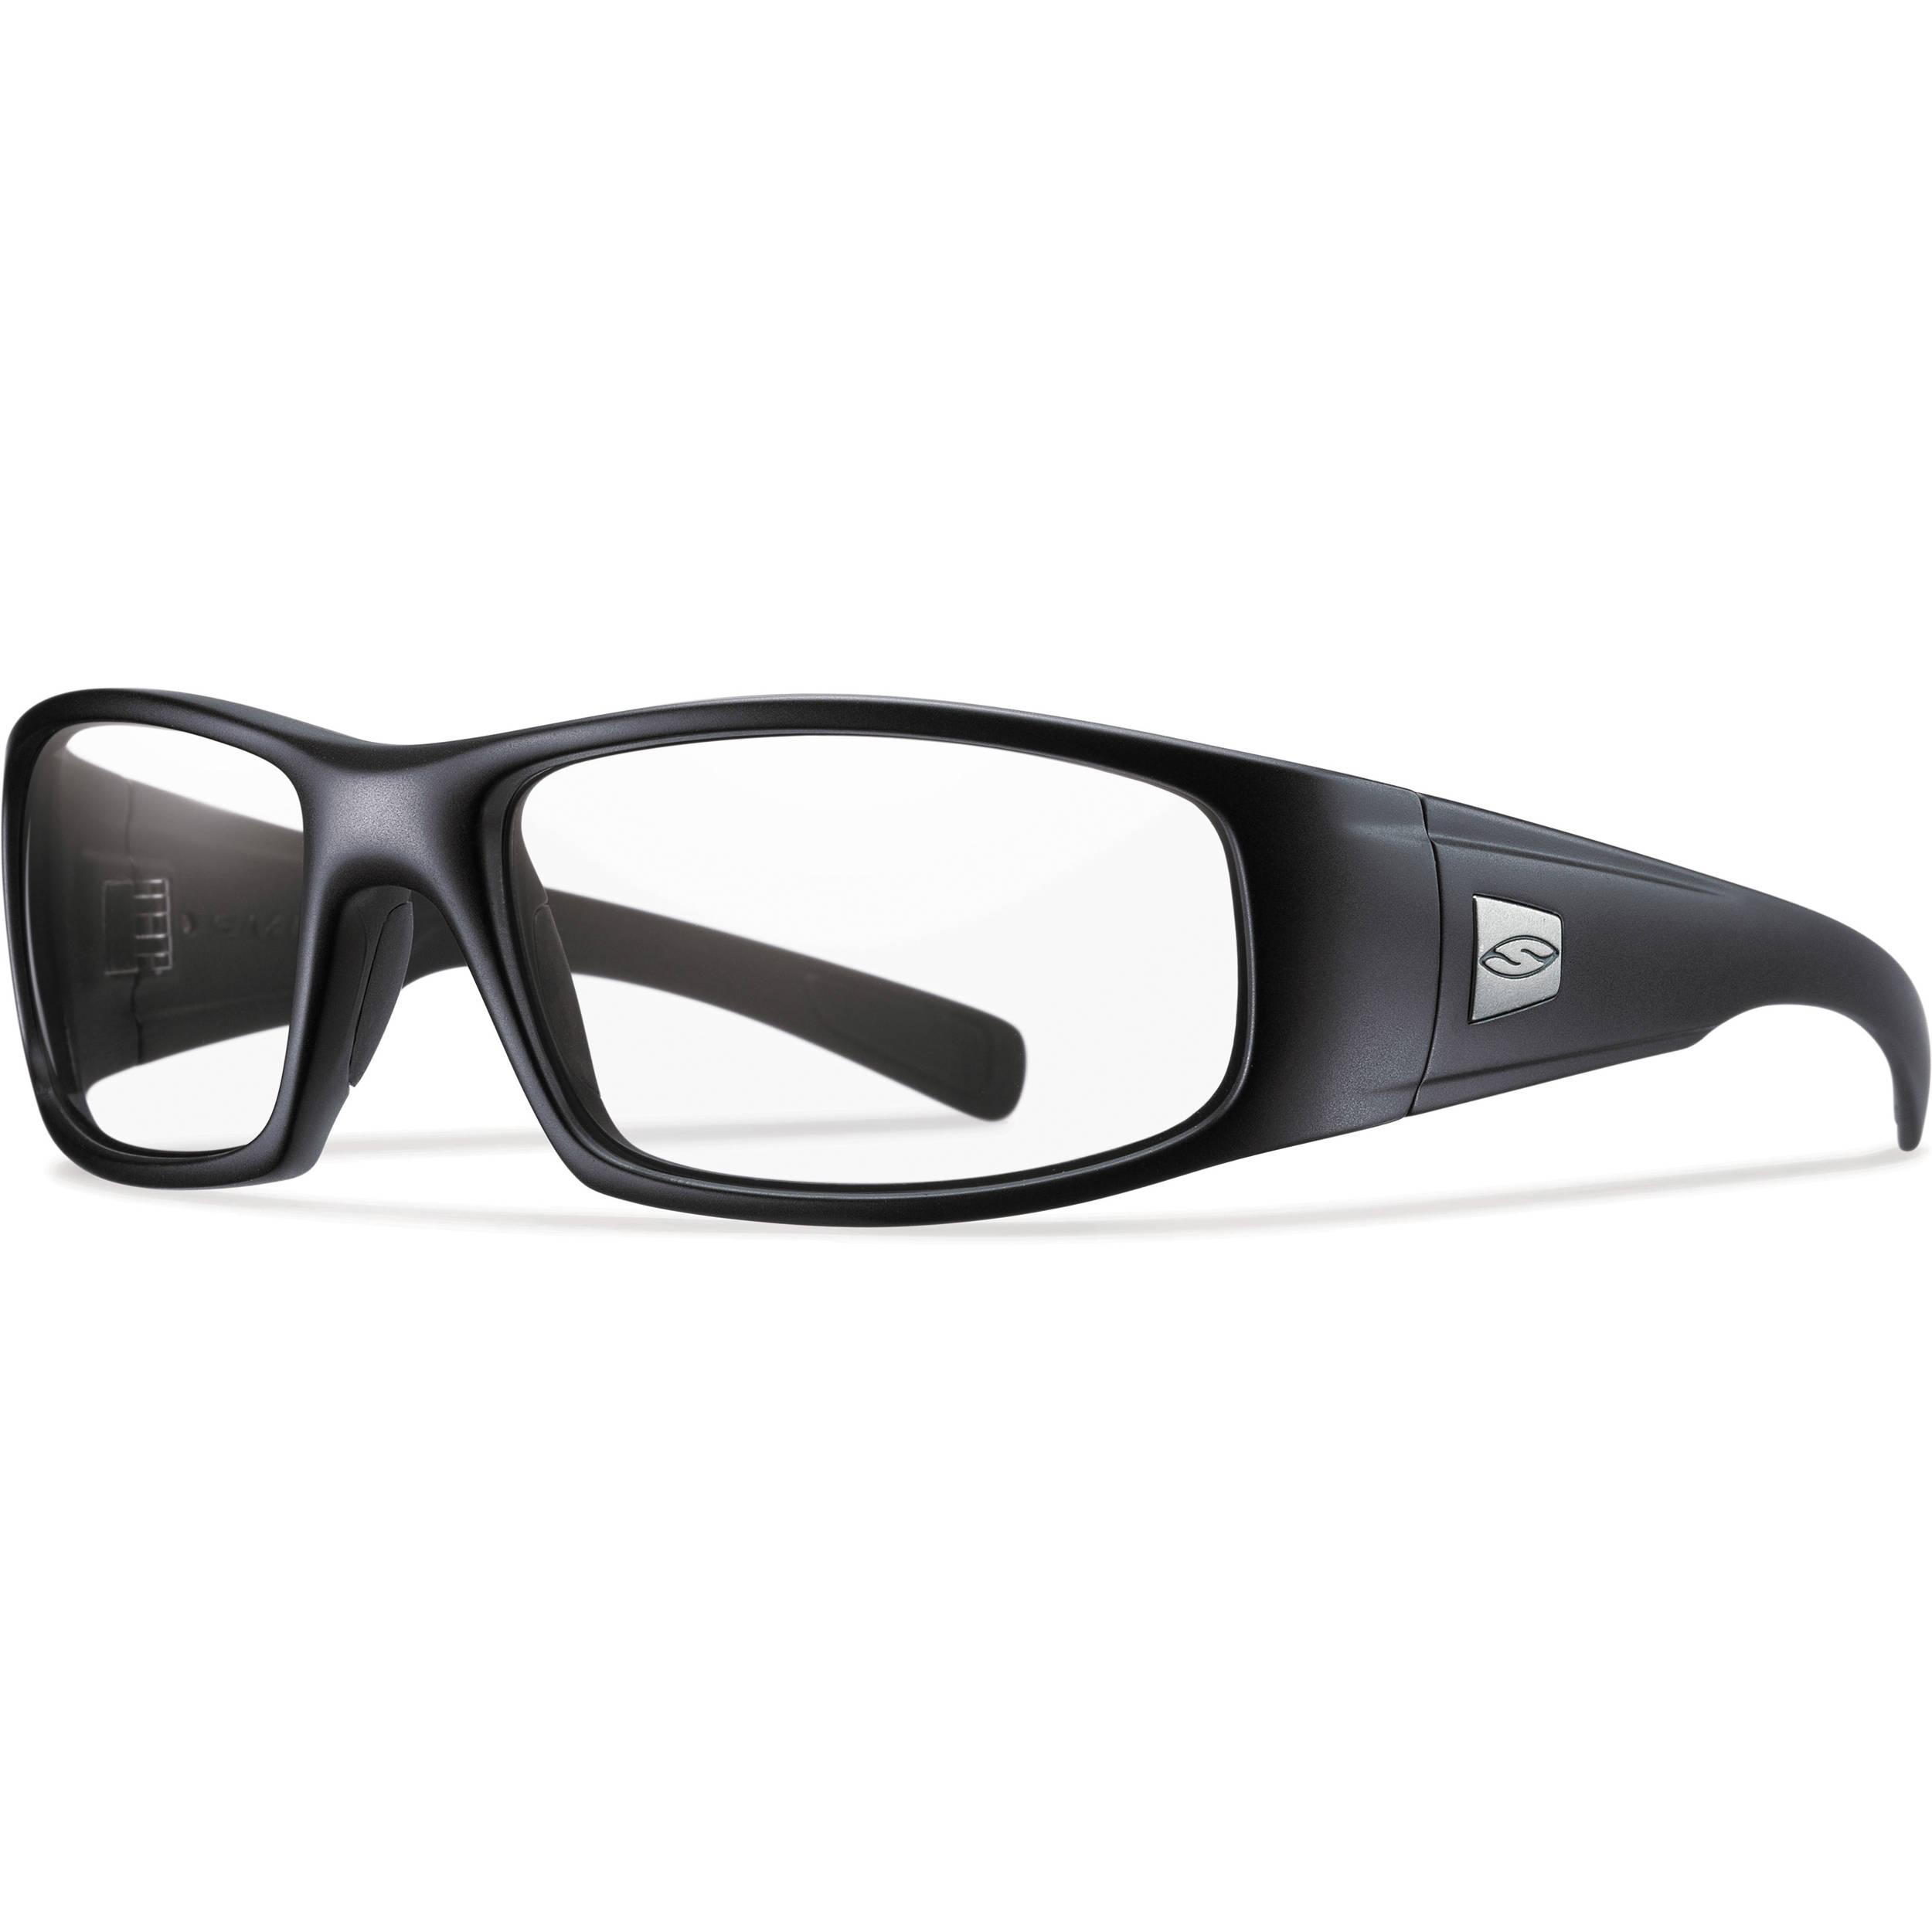 e4eeb47ec4e Smith Optics Hideout Elite Tactical Sunglasses (Black - Clear Lens)